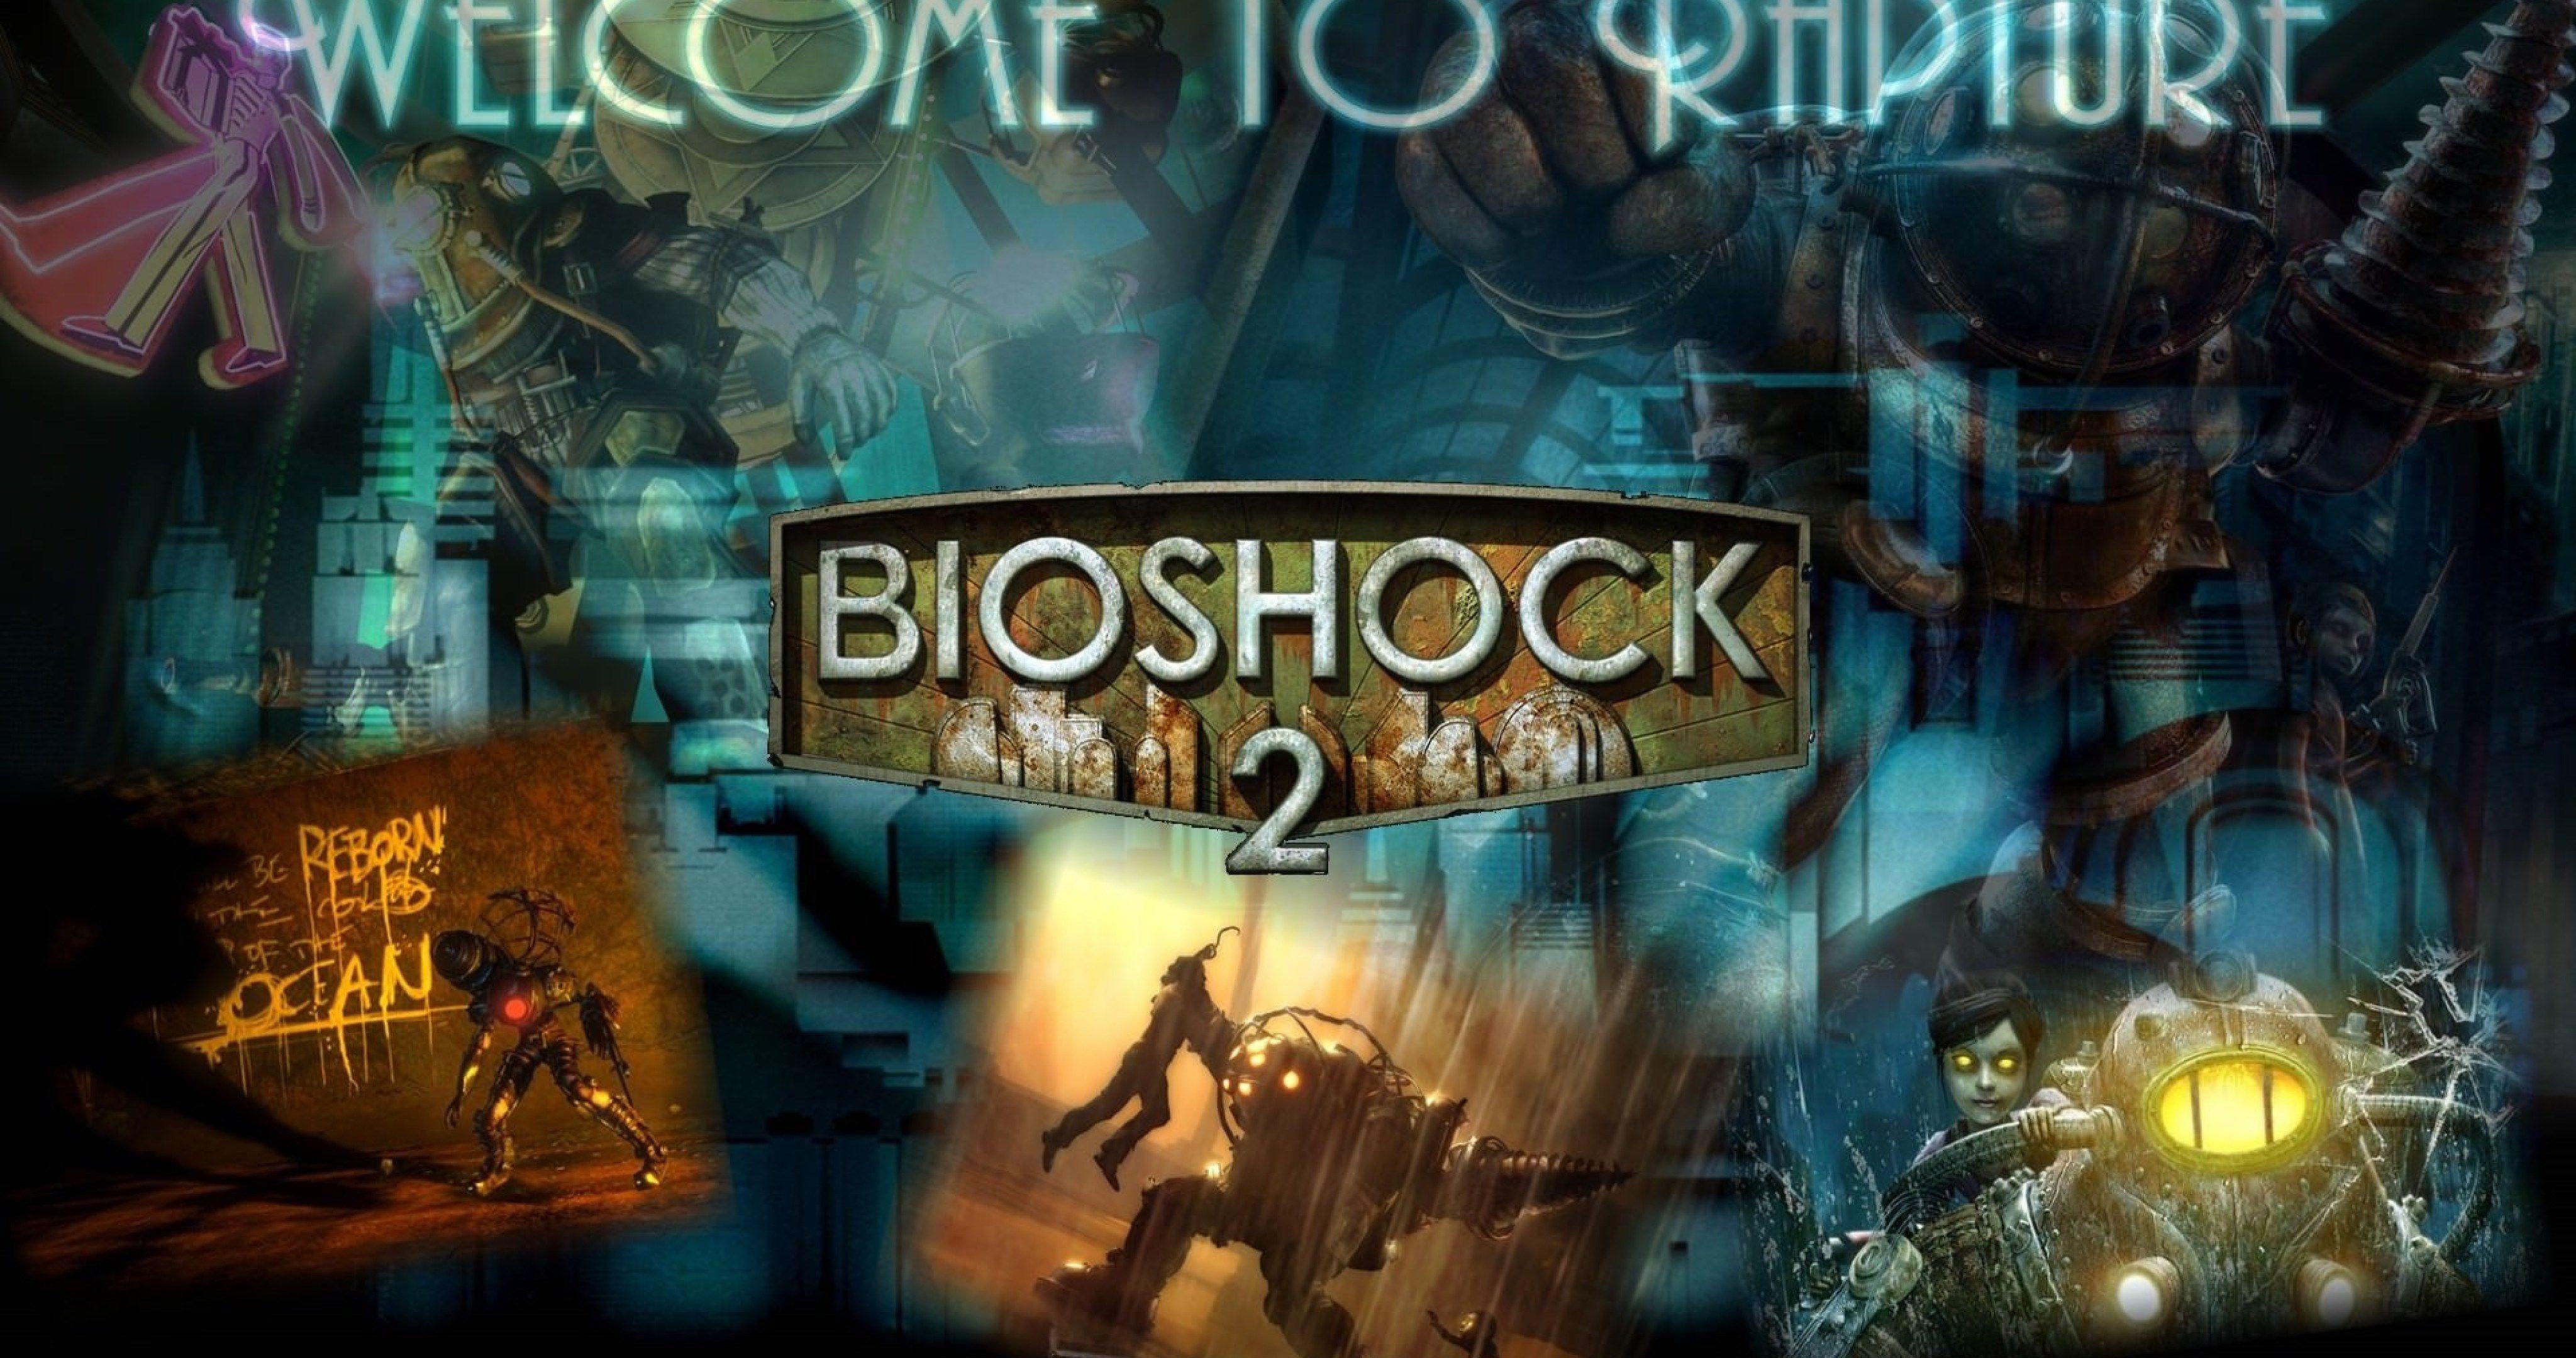 Bioshock 2 Game Wallpaper 4k Ultra Hd Wallpaper Bioshock Bioshock 2 Bioshock Game